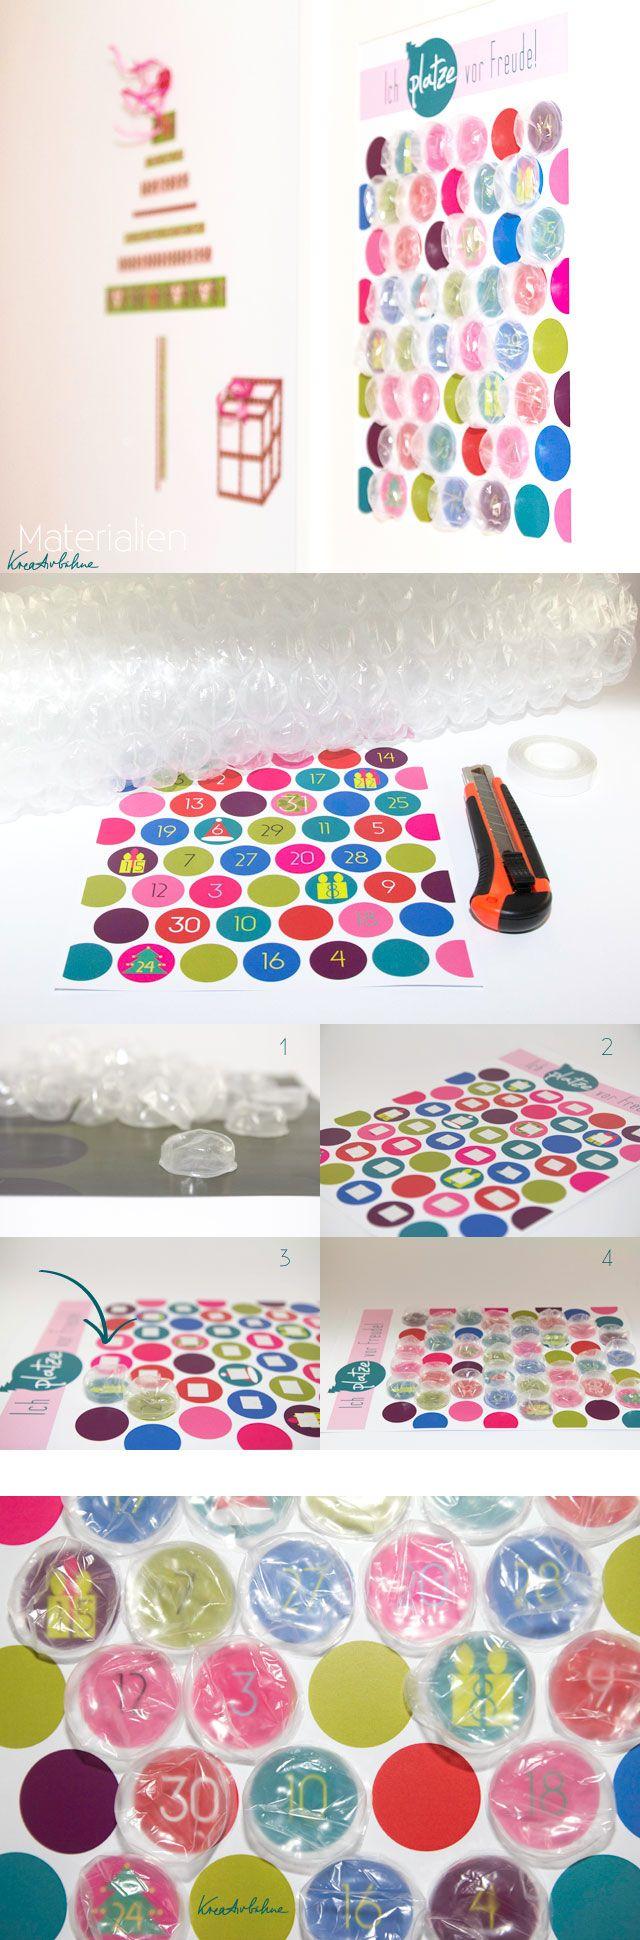 Adventskalender zum Platzen +++ Repin awesome bubble wrap avdvent calendar